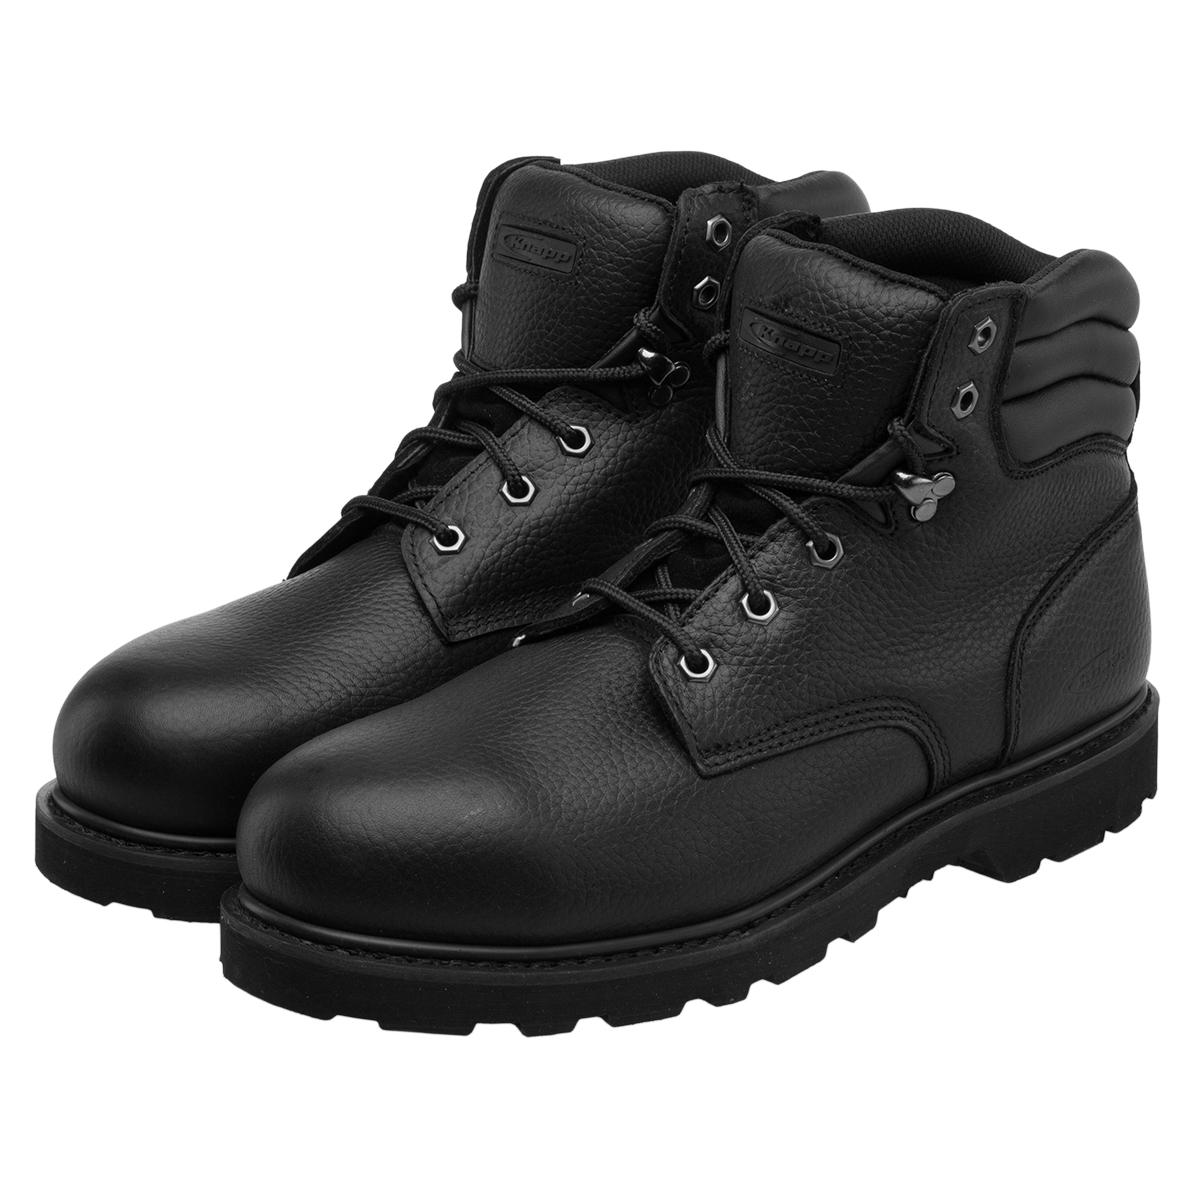 Knapp Steel Toe Work Shoes